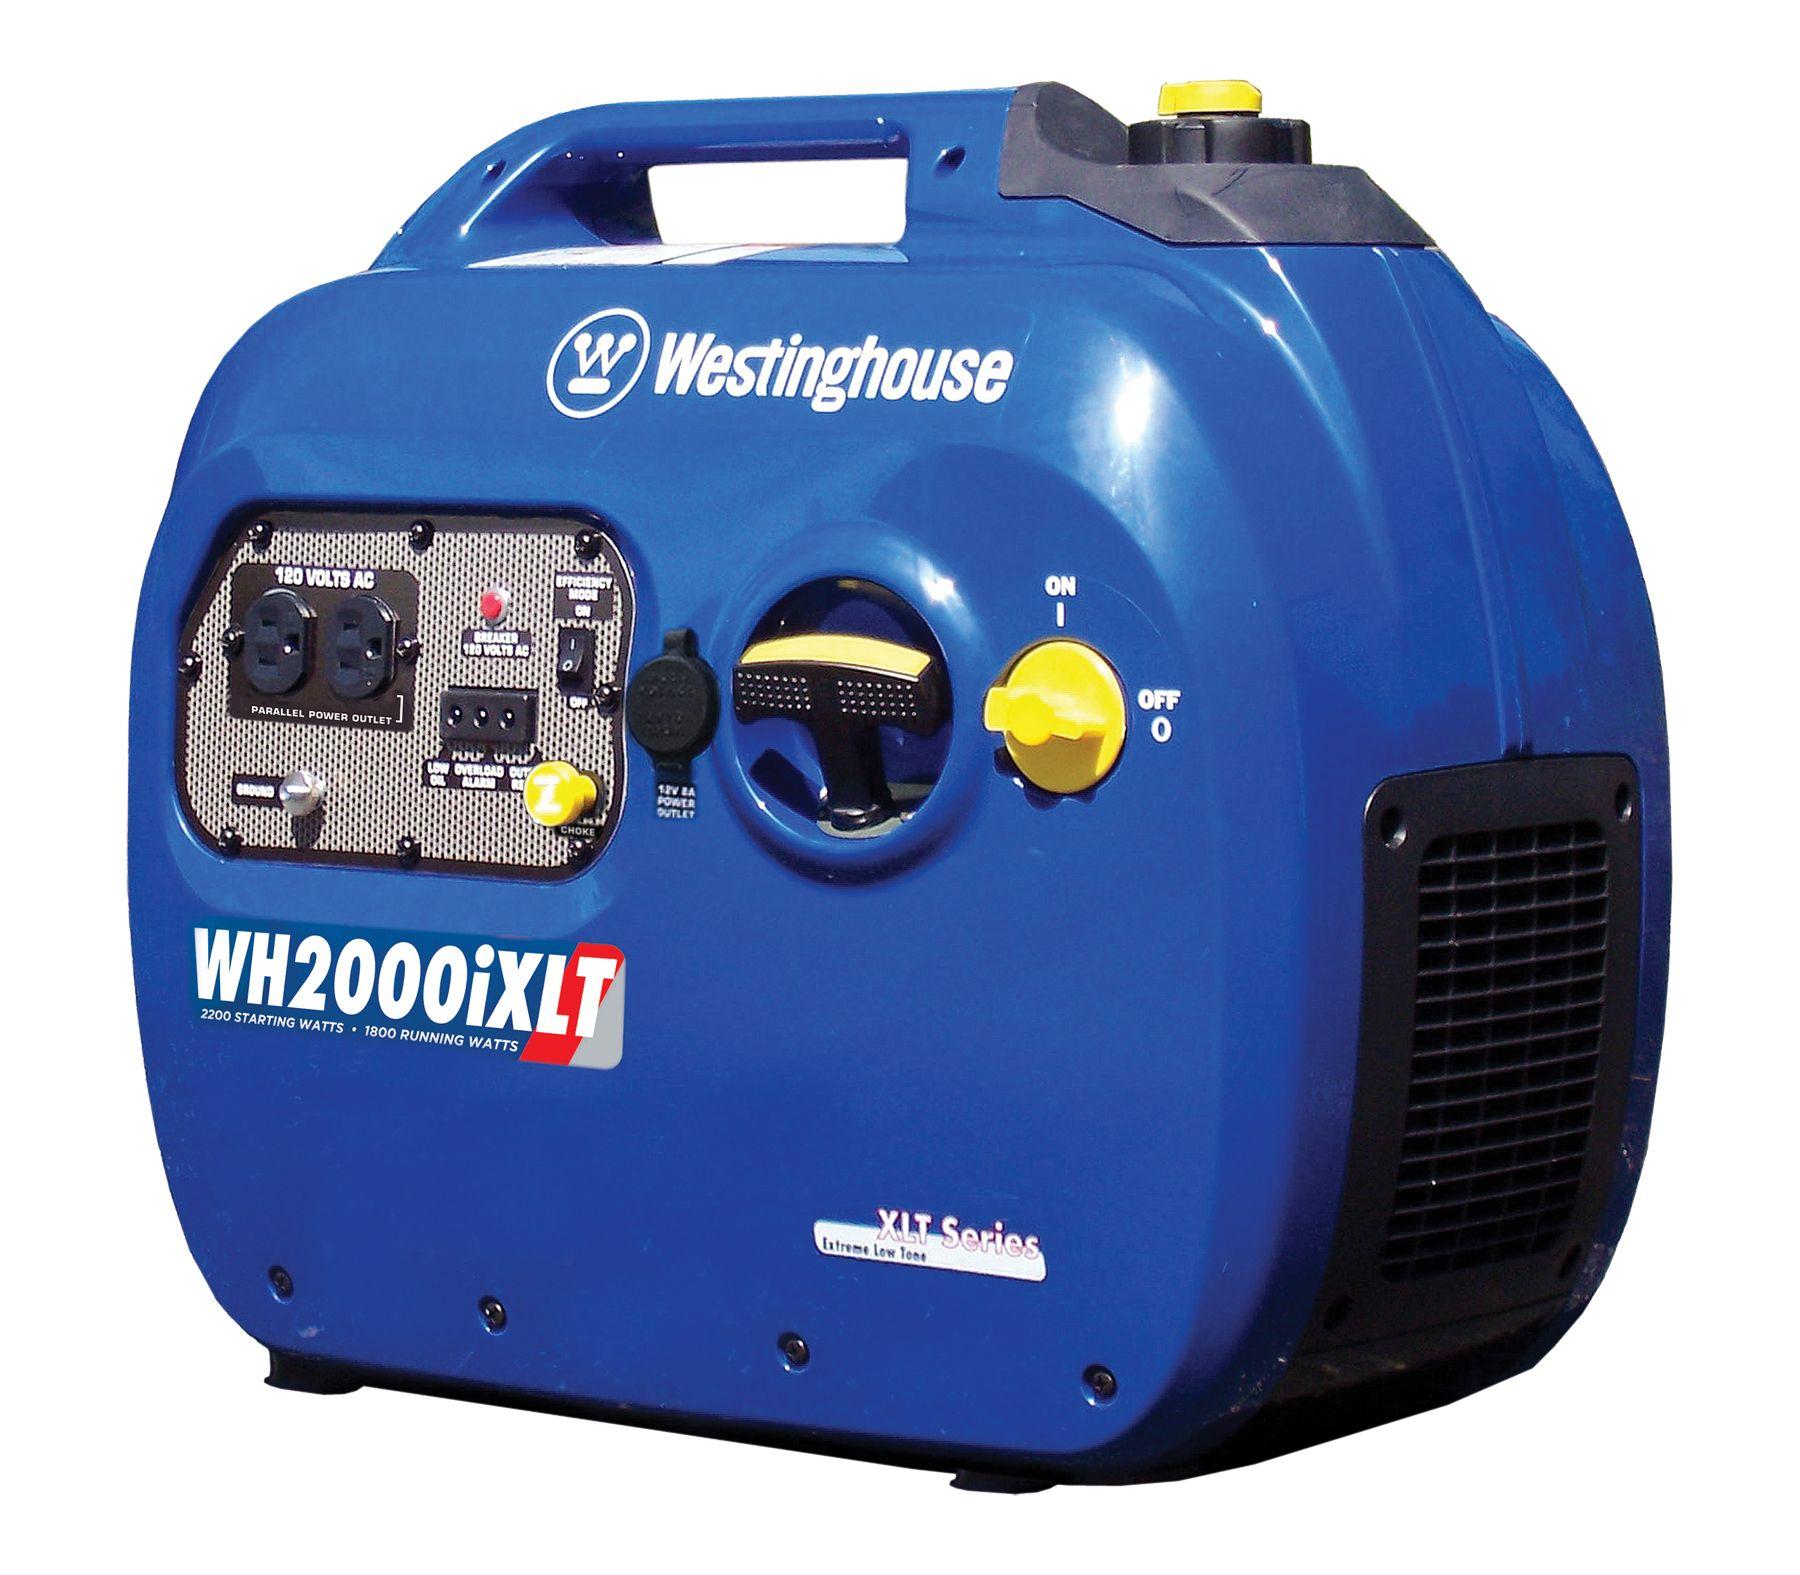 Westinghouse WH2000iXLT Inverter Generator